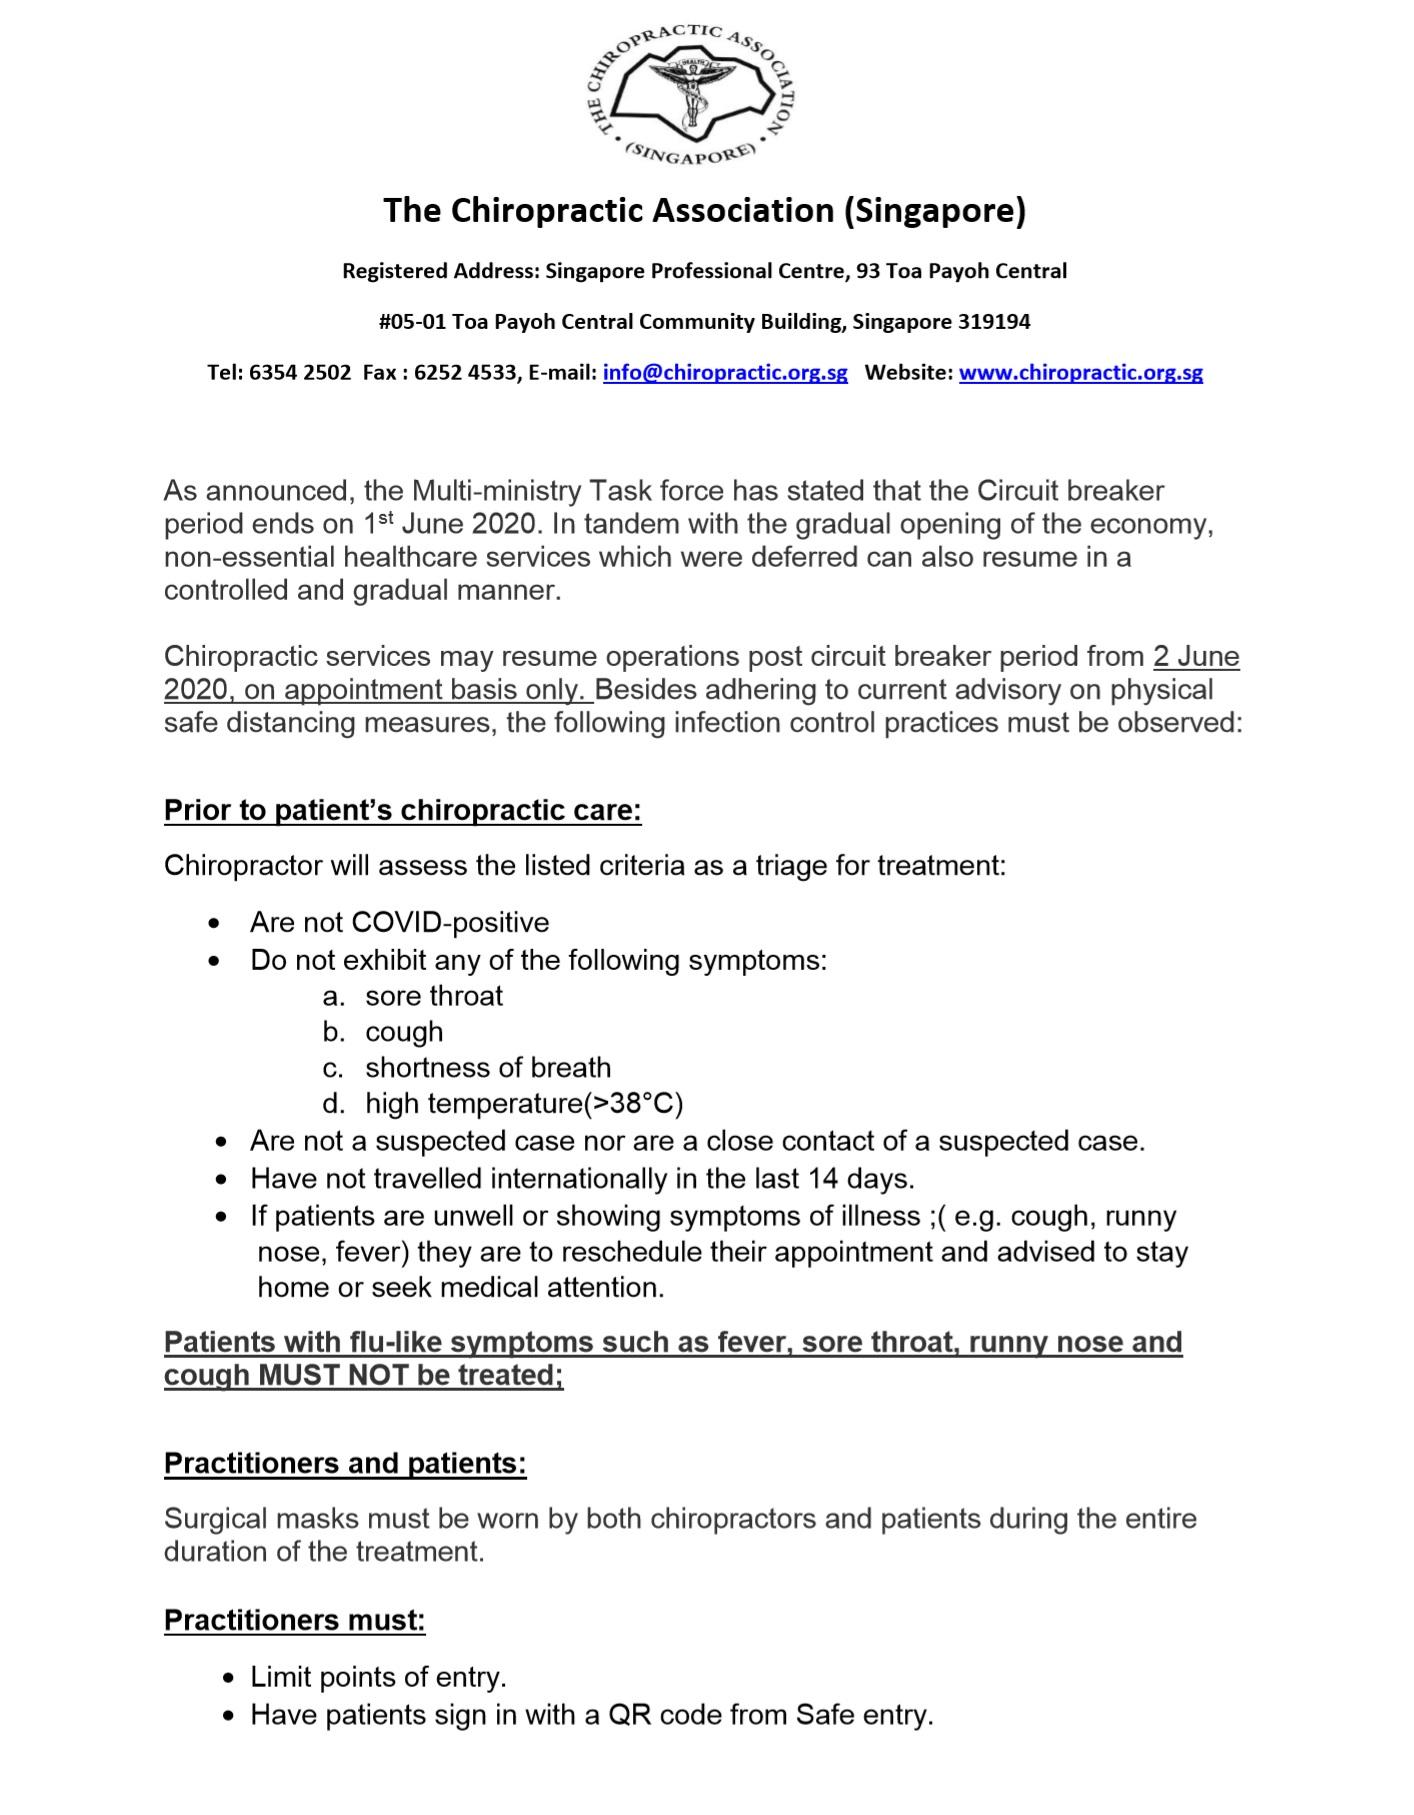 Chiropractor Guideline